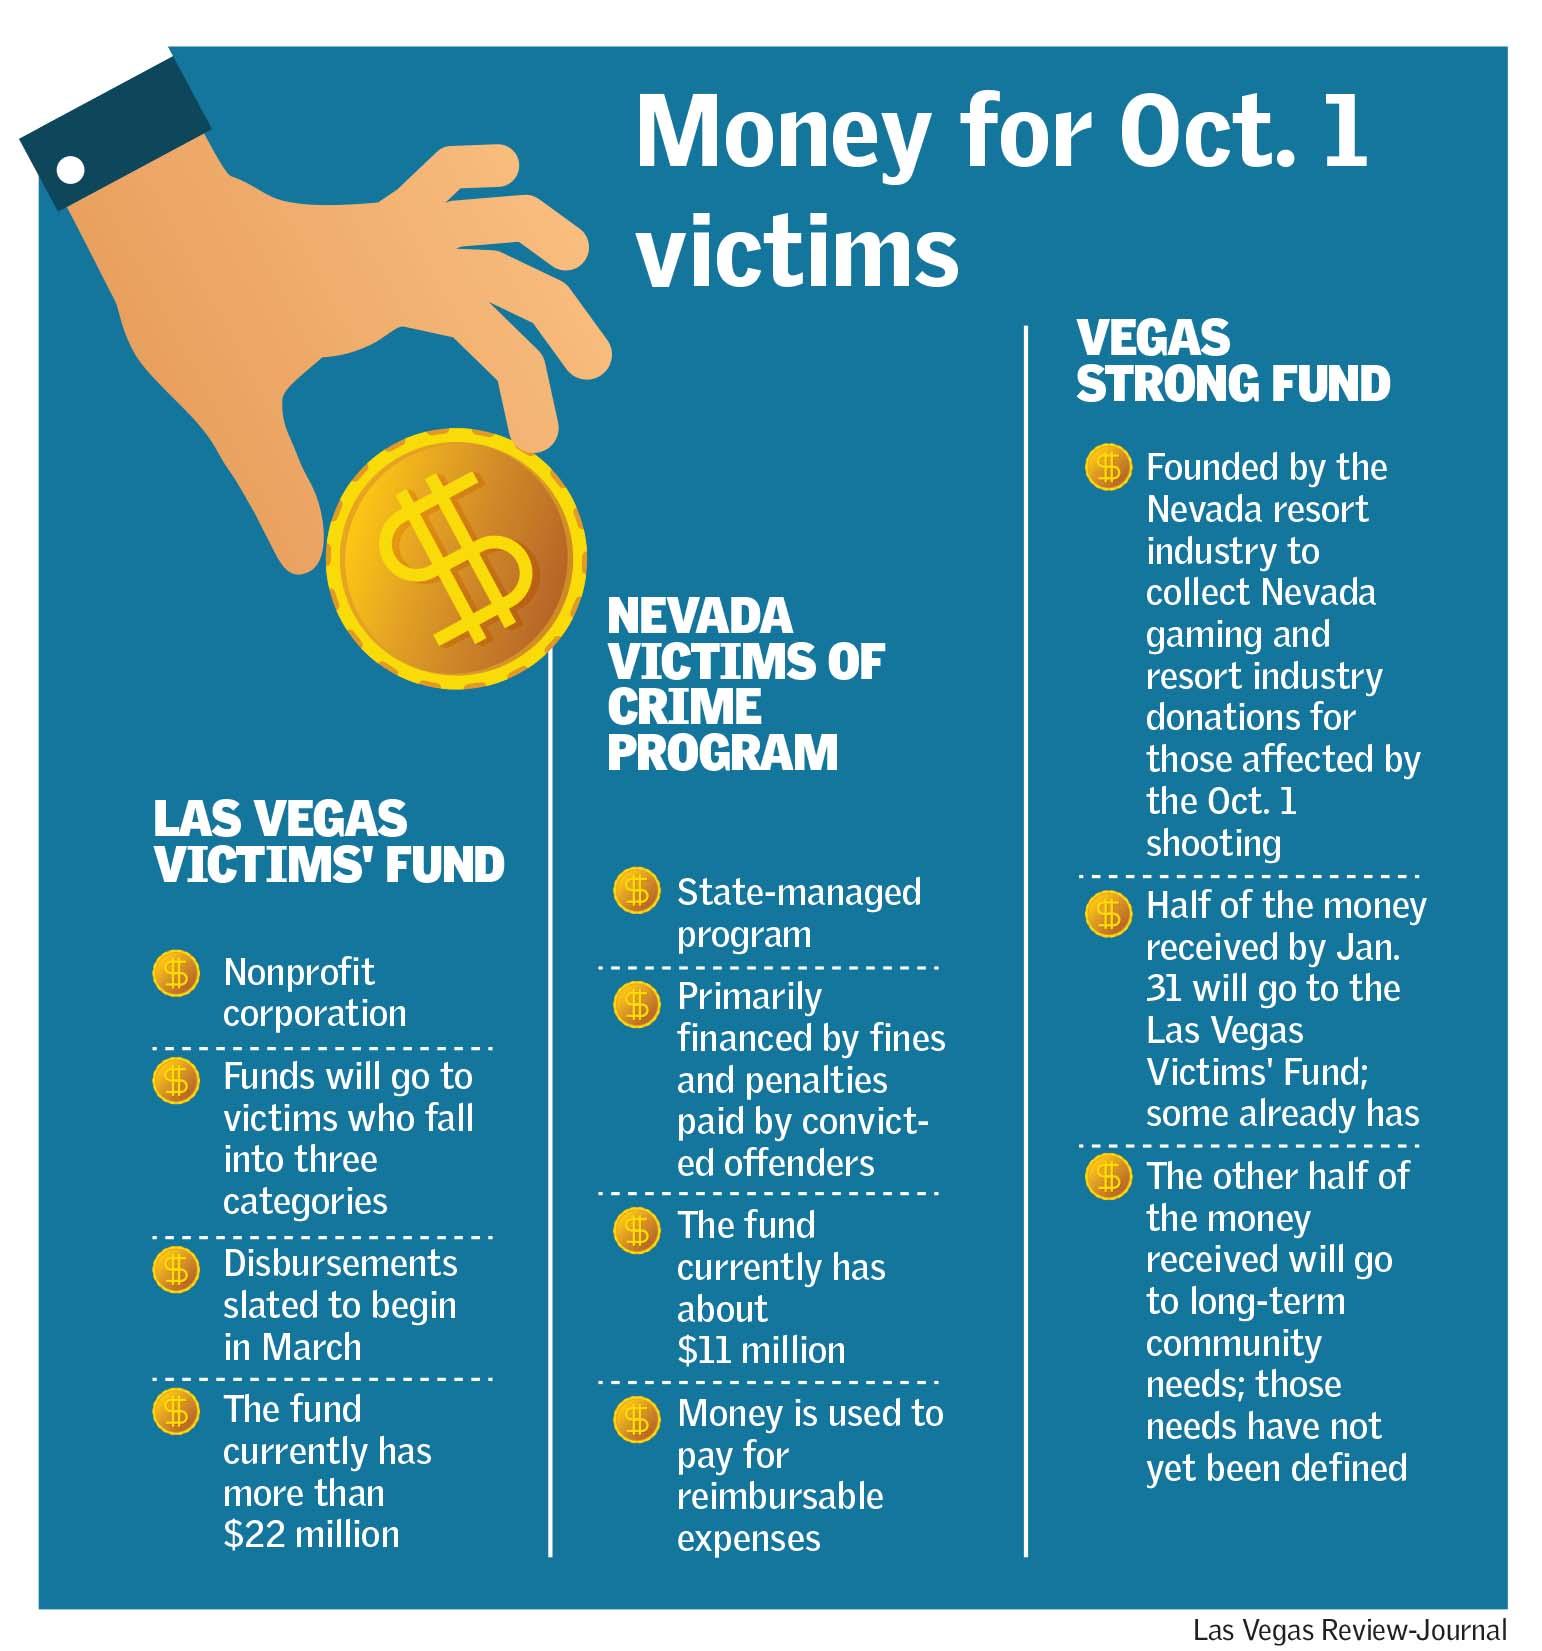 (Las Vegas Review-Journal)